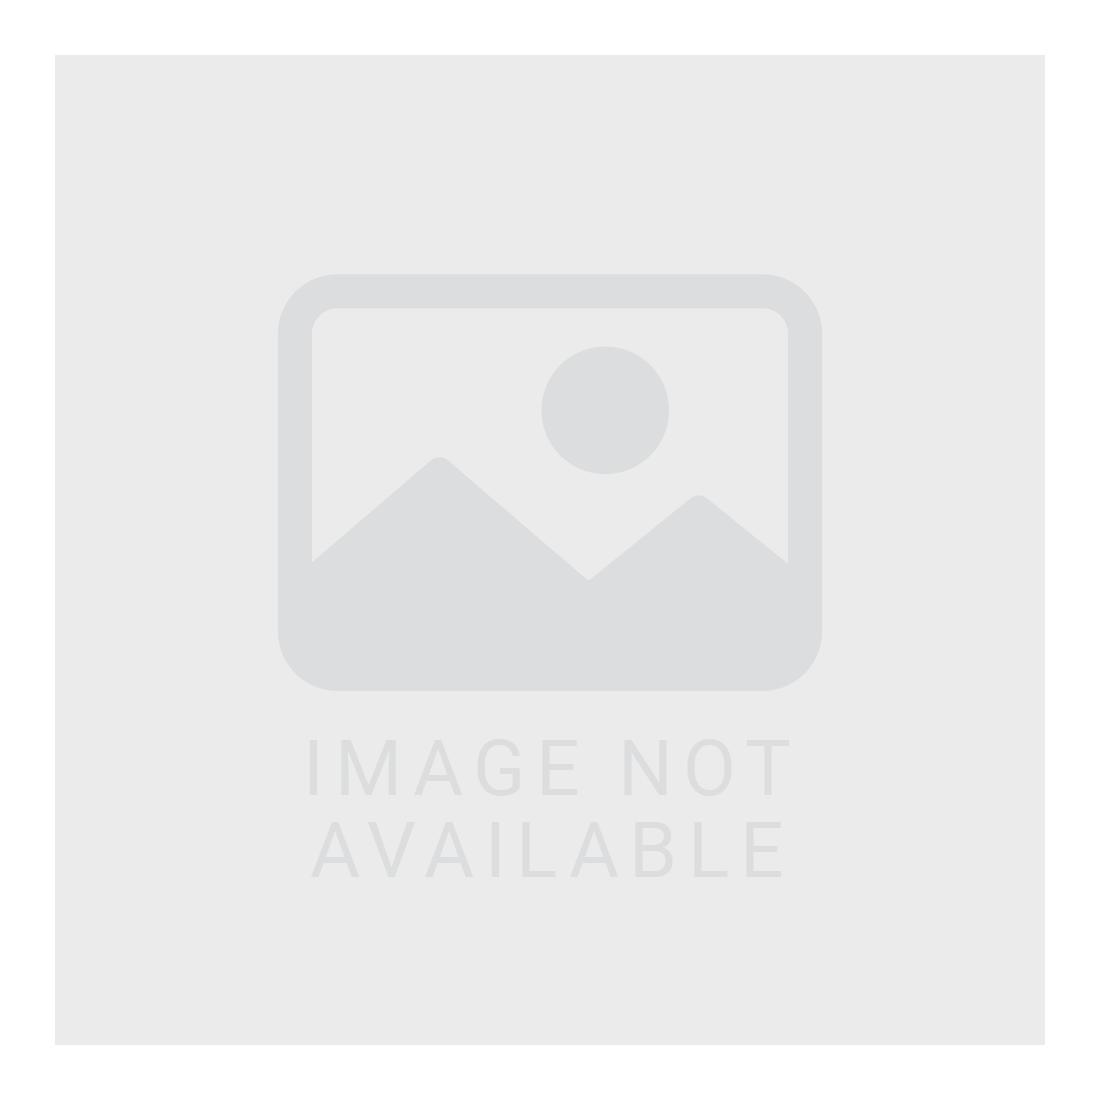 $25 FIAT Merchandise Gift Card